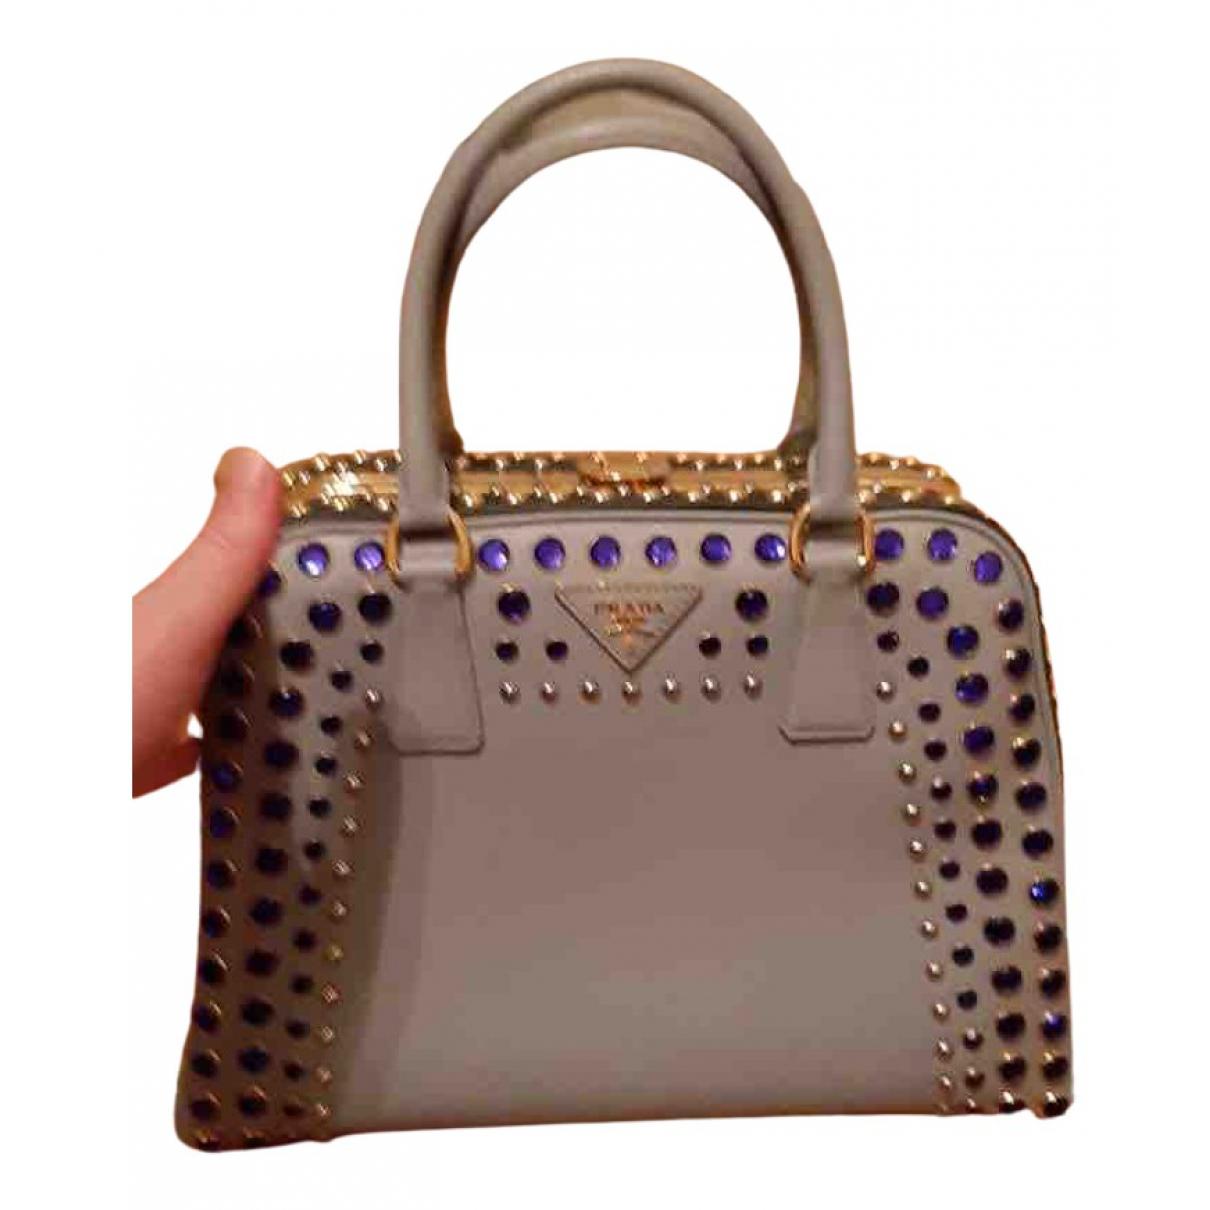 Prada N Multicolour Leather handbag for Women N